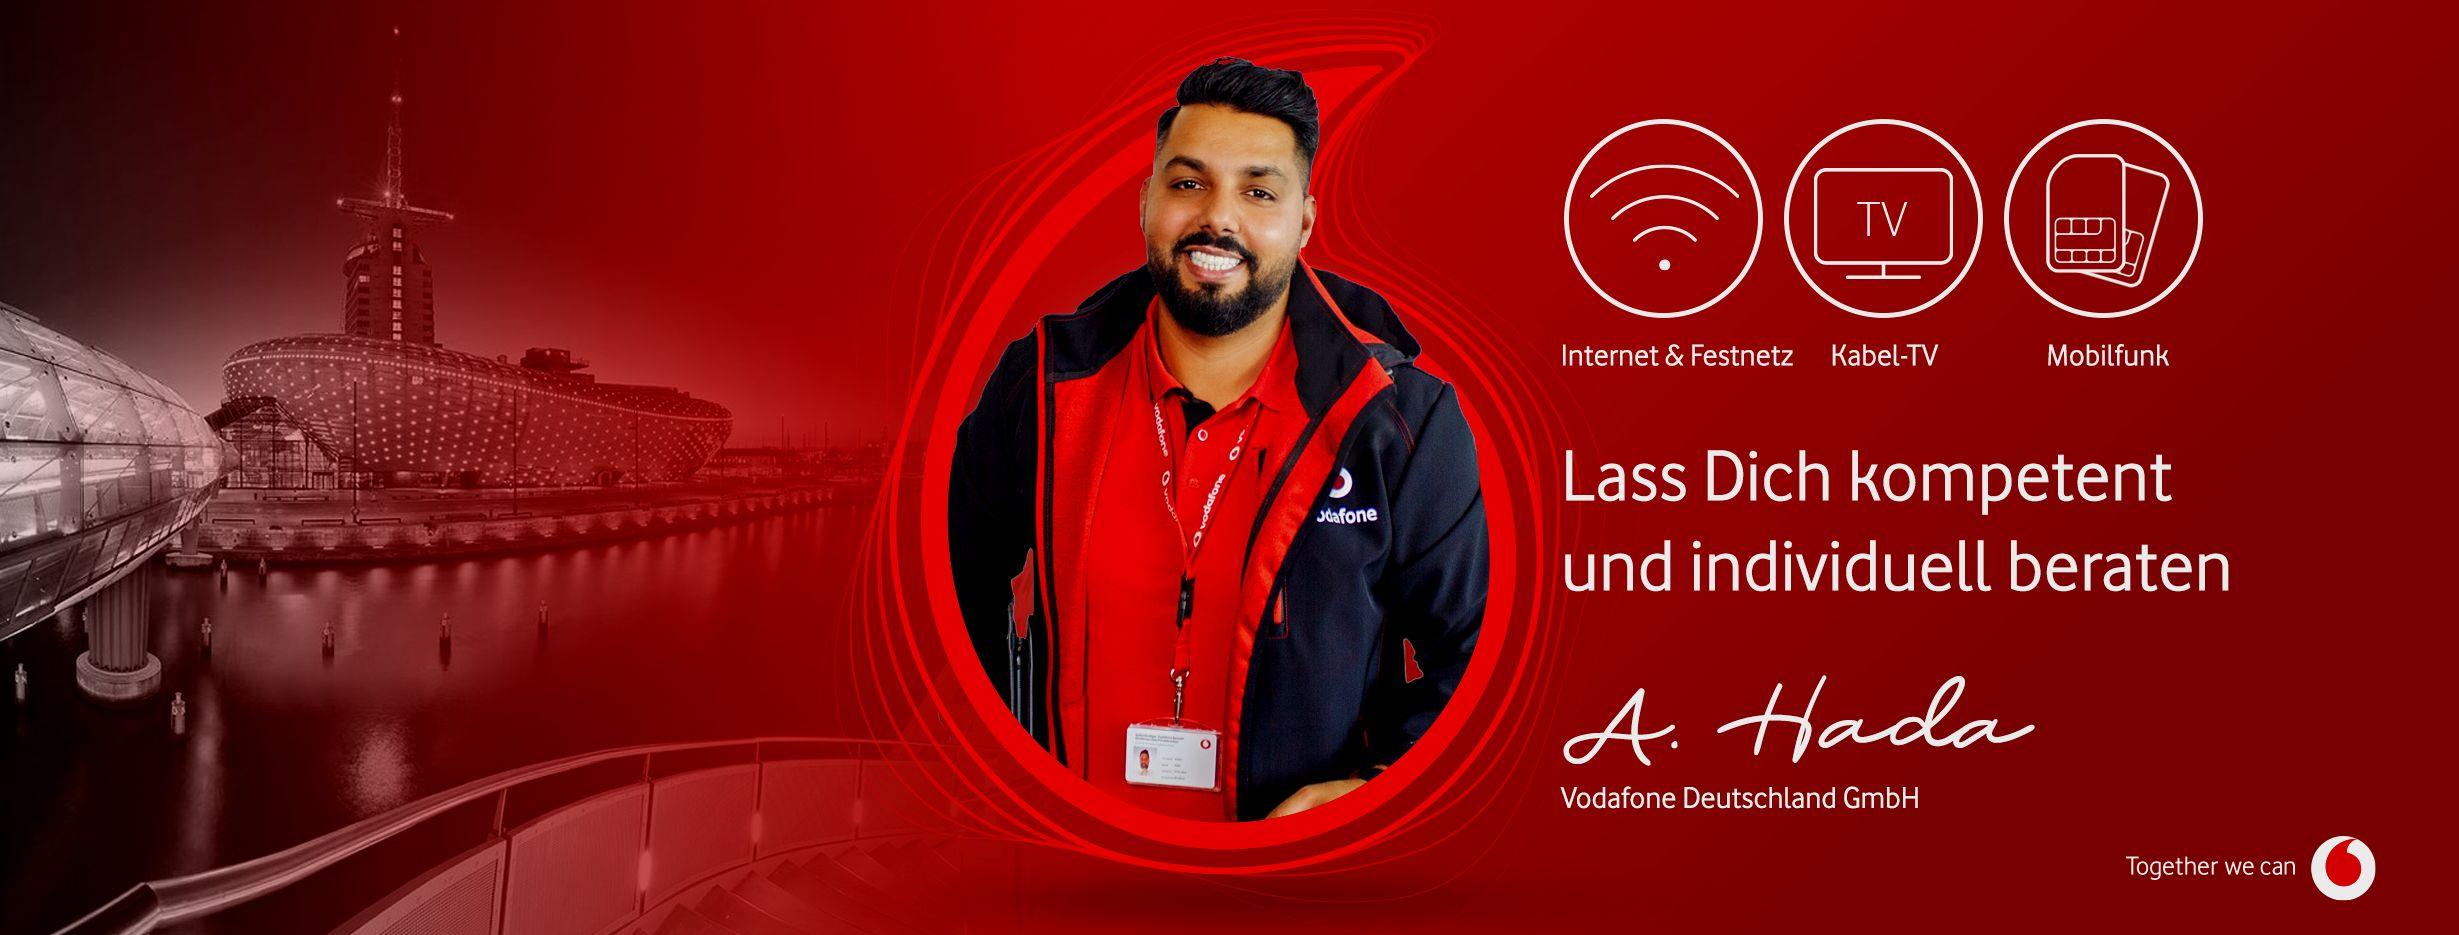 Vodafone Berater